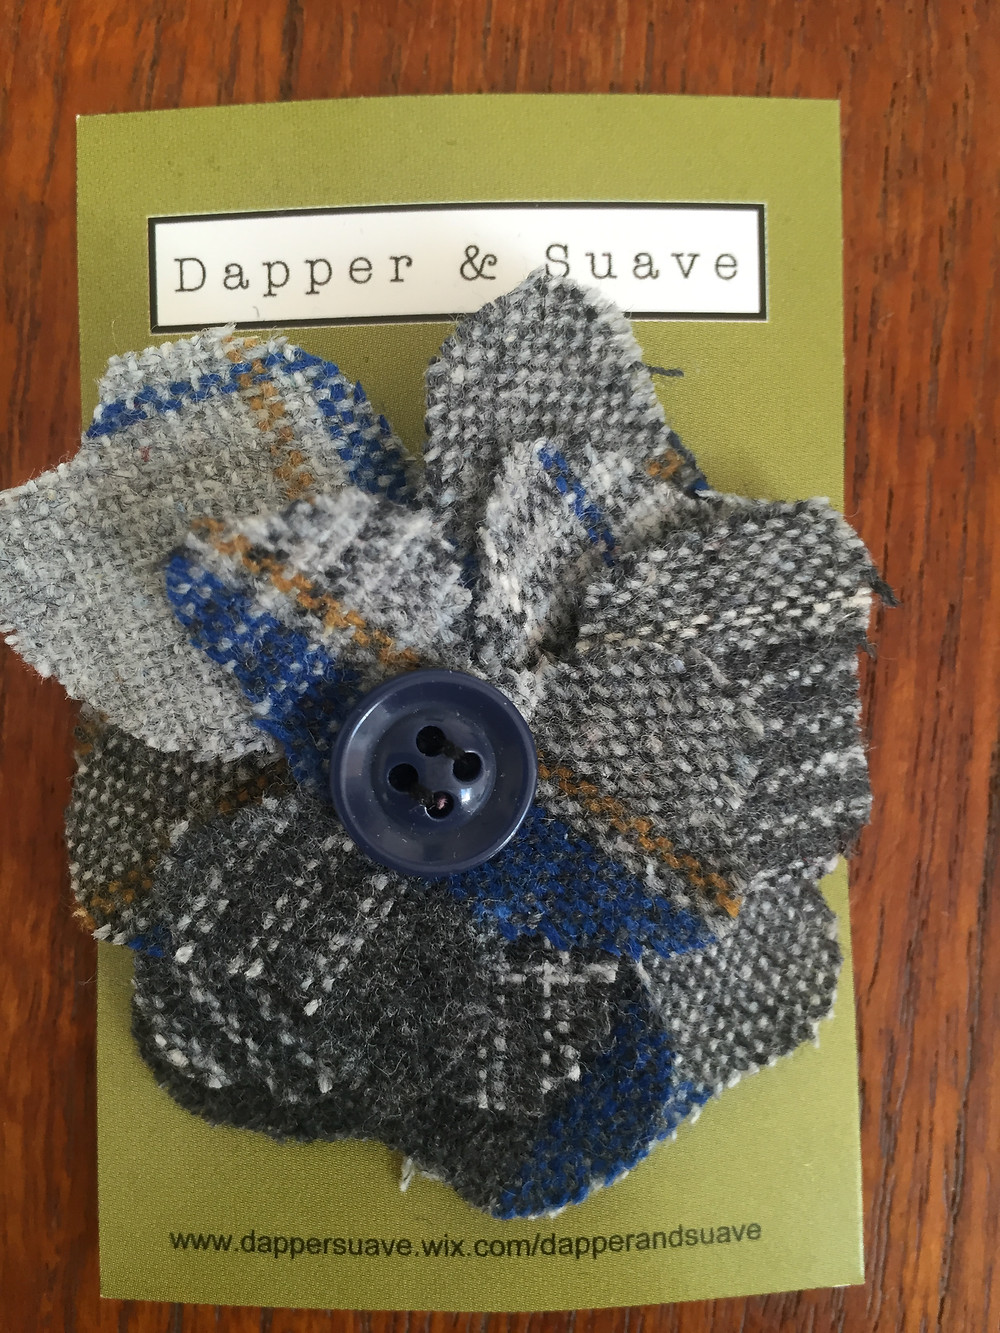 Dapper & Suave Tweed Button Lapel Pin